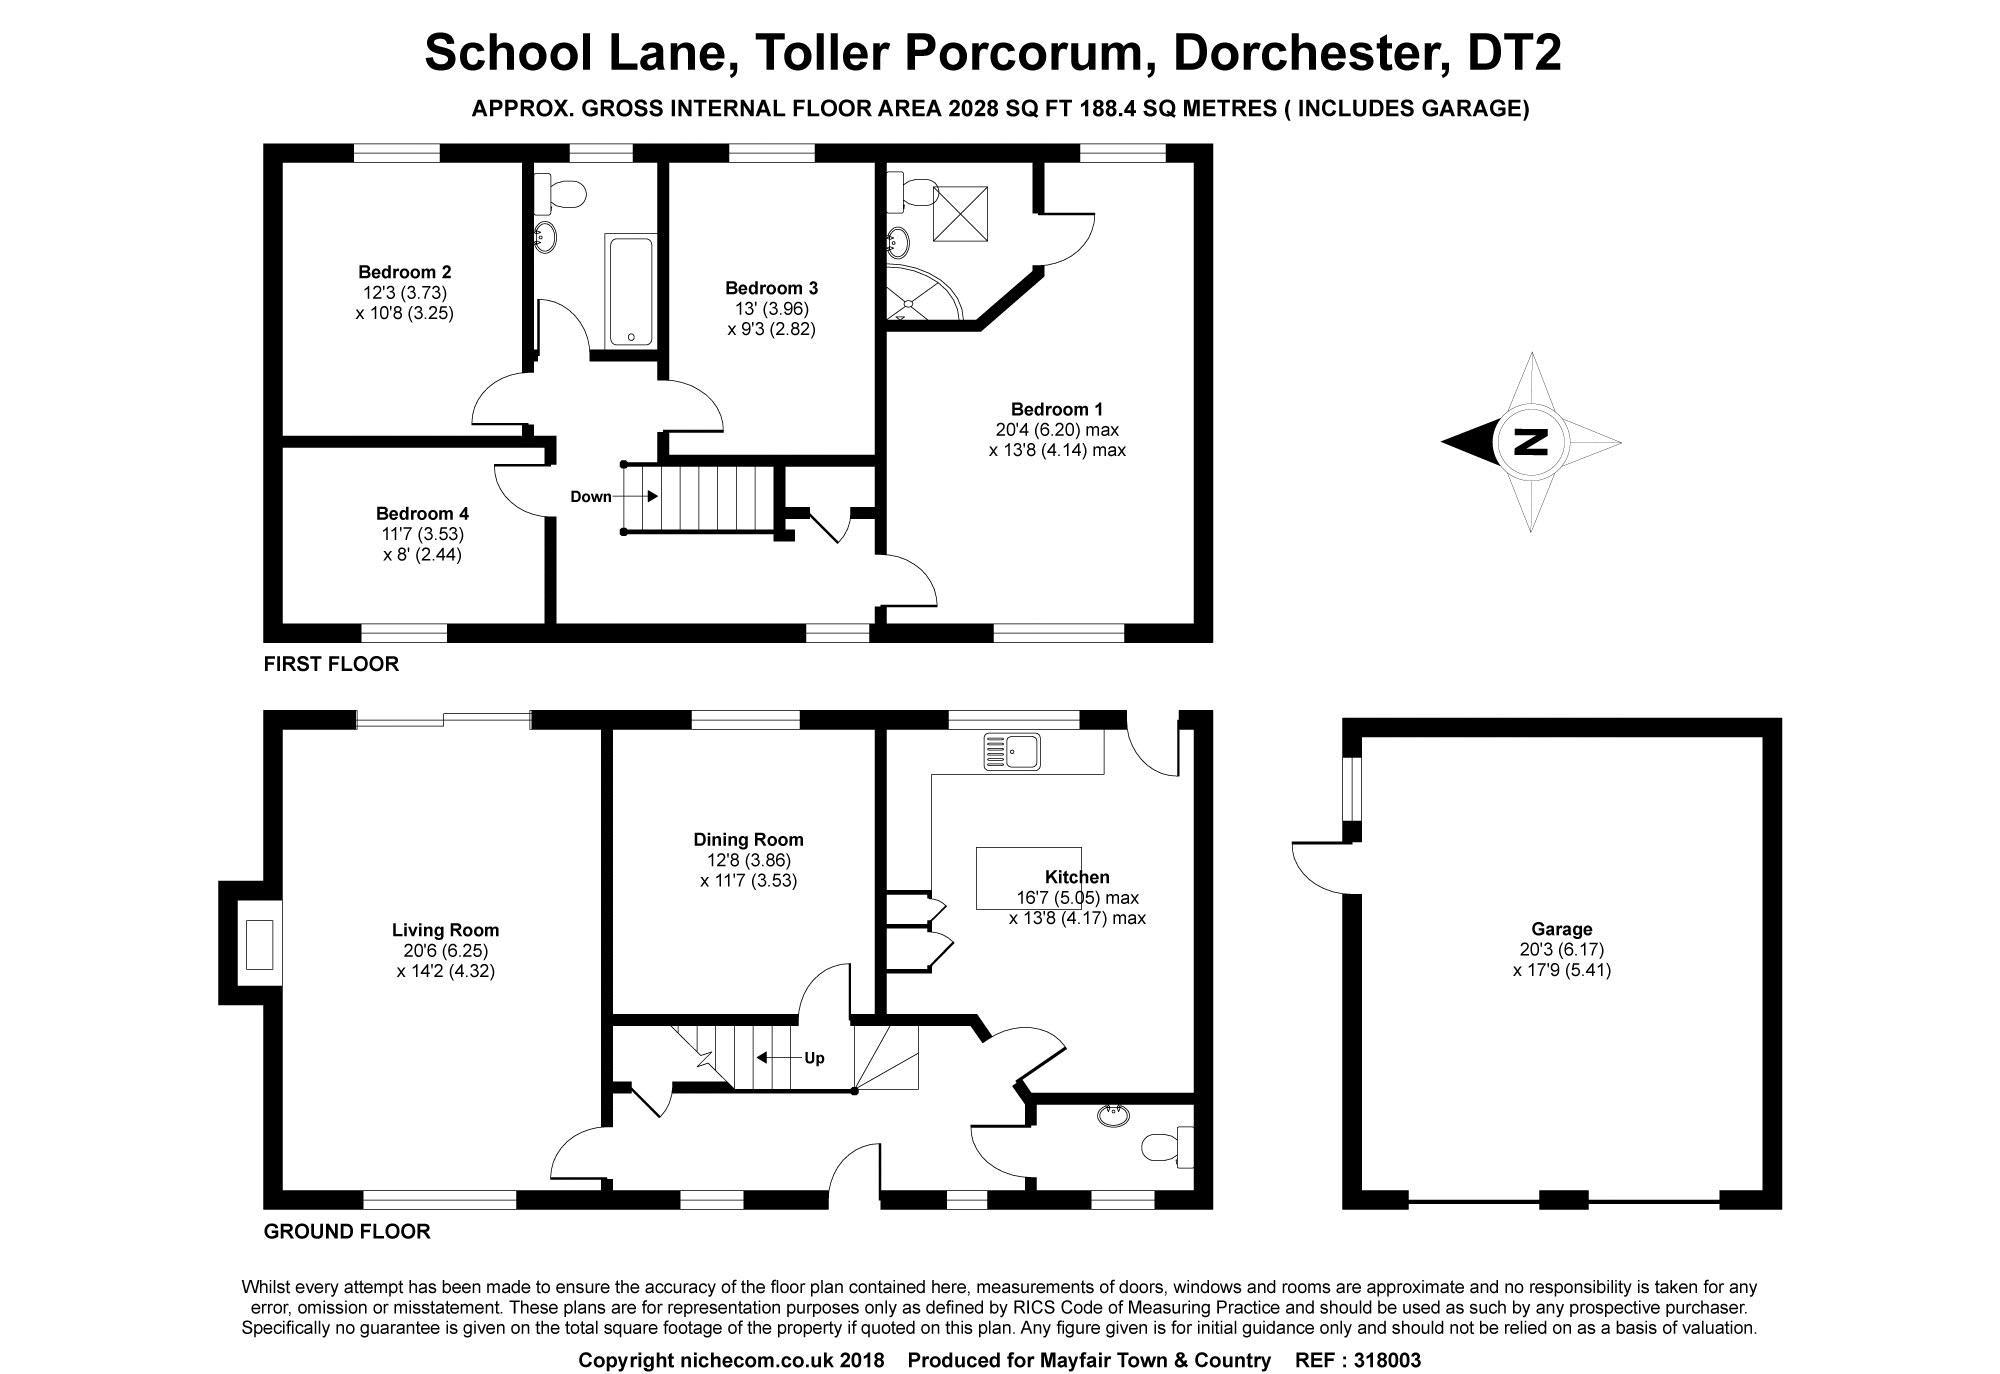 School Lane Toller Porcorum